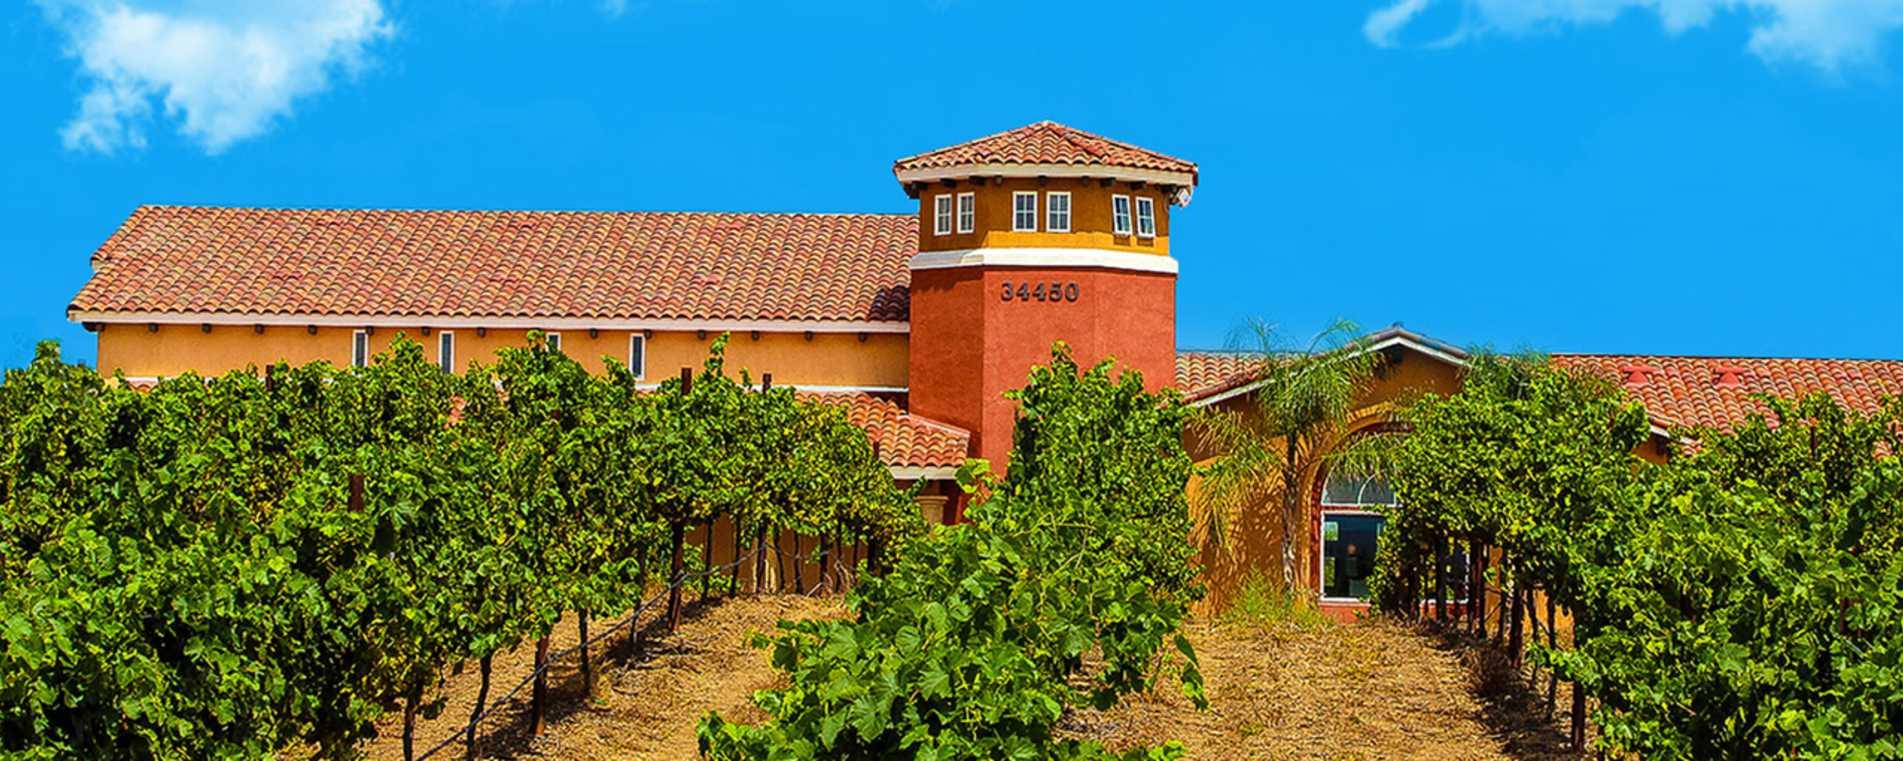 Carter Estate Winery and Resort - Temecula